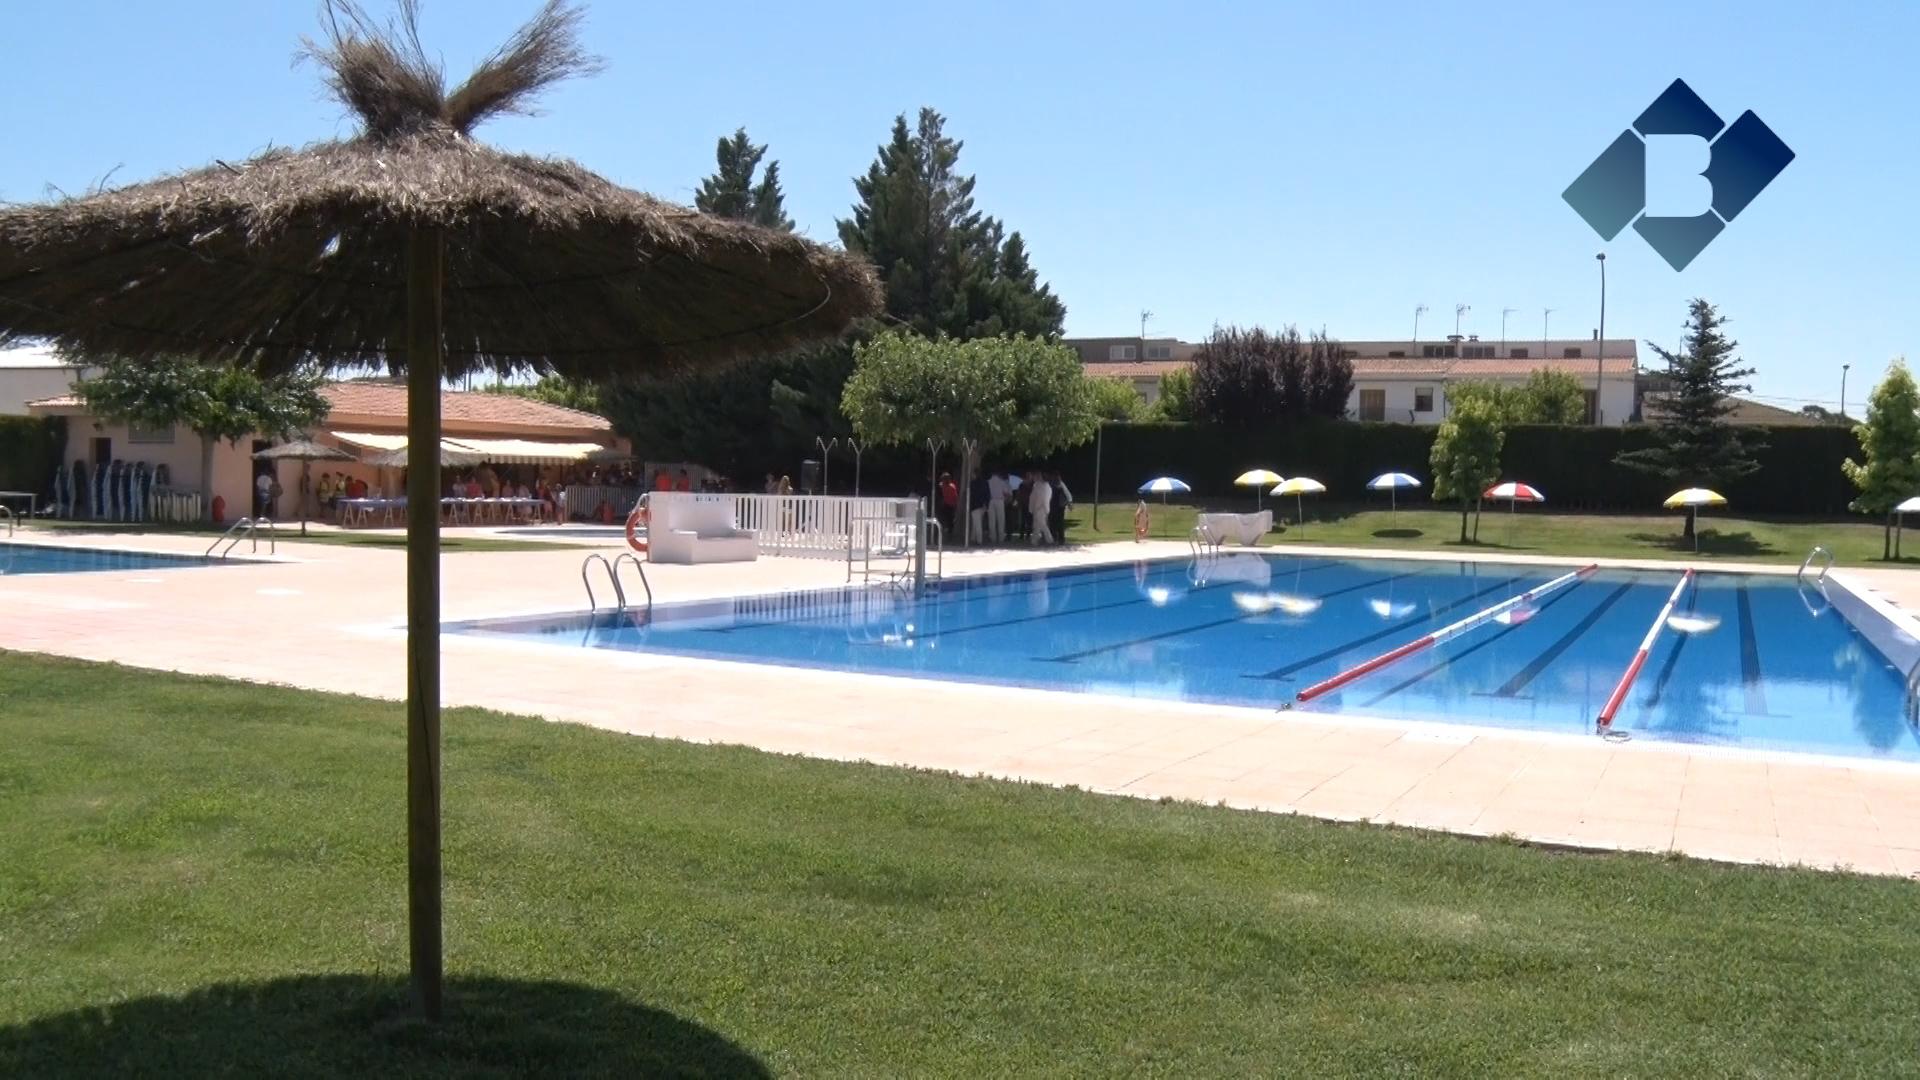 T rmens inaugura la reforma de les piscines municipals for Piscines lleida